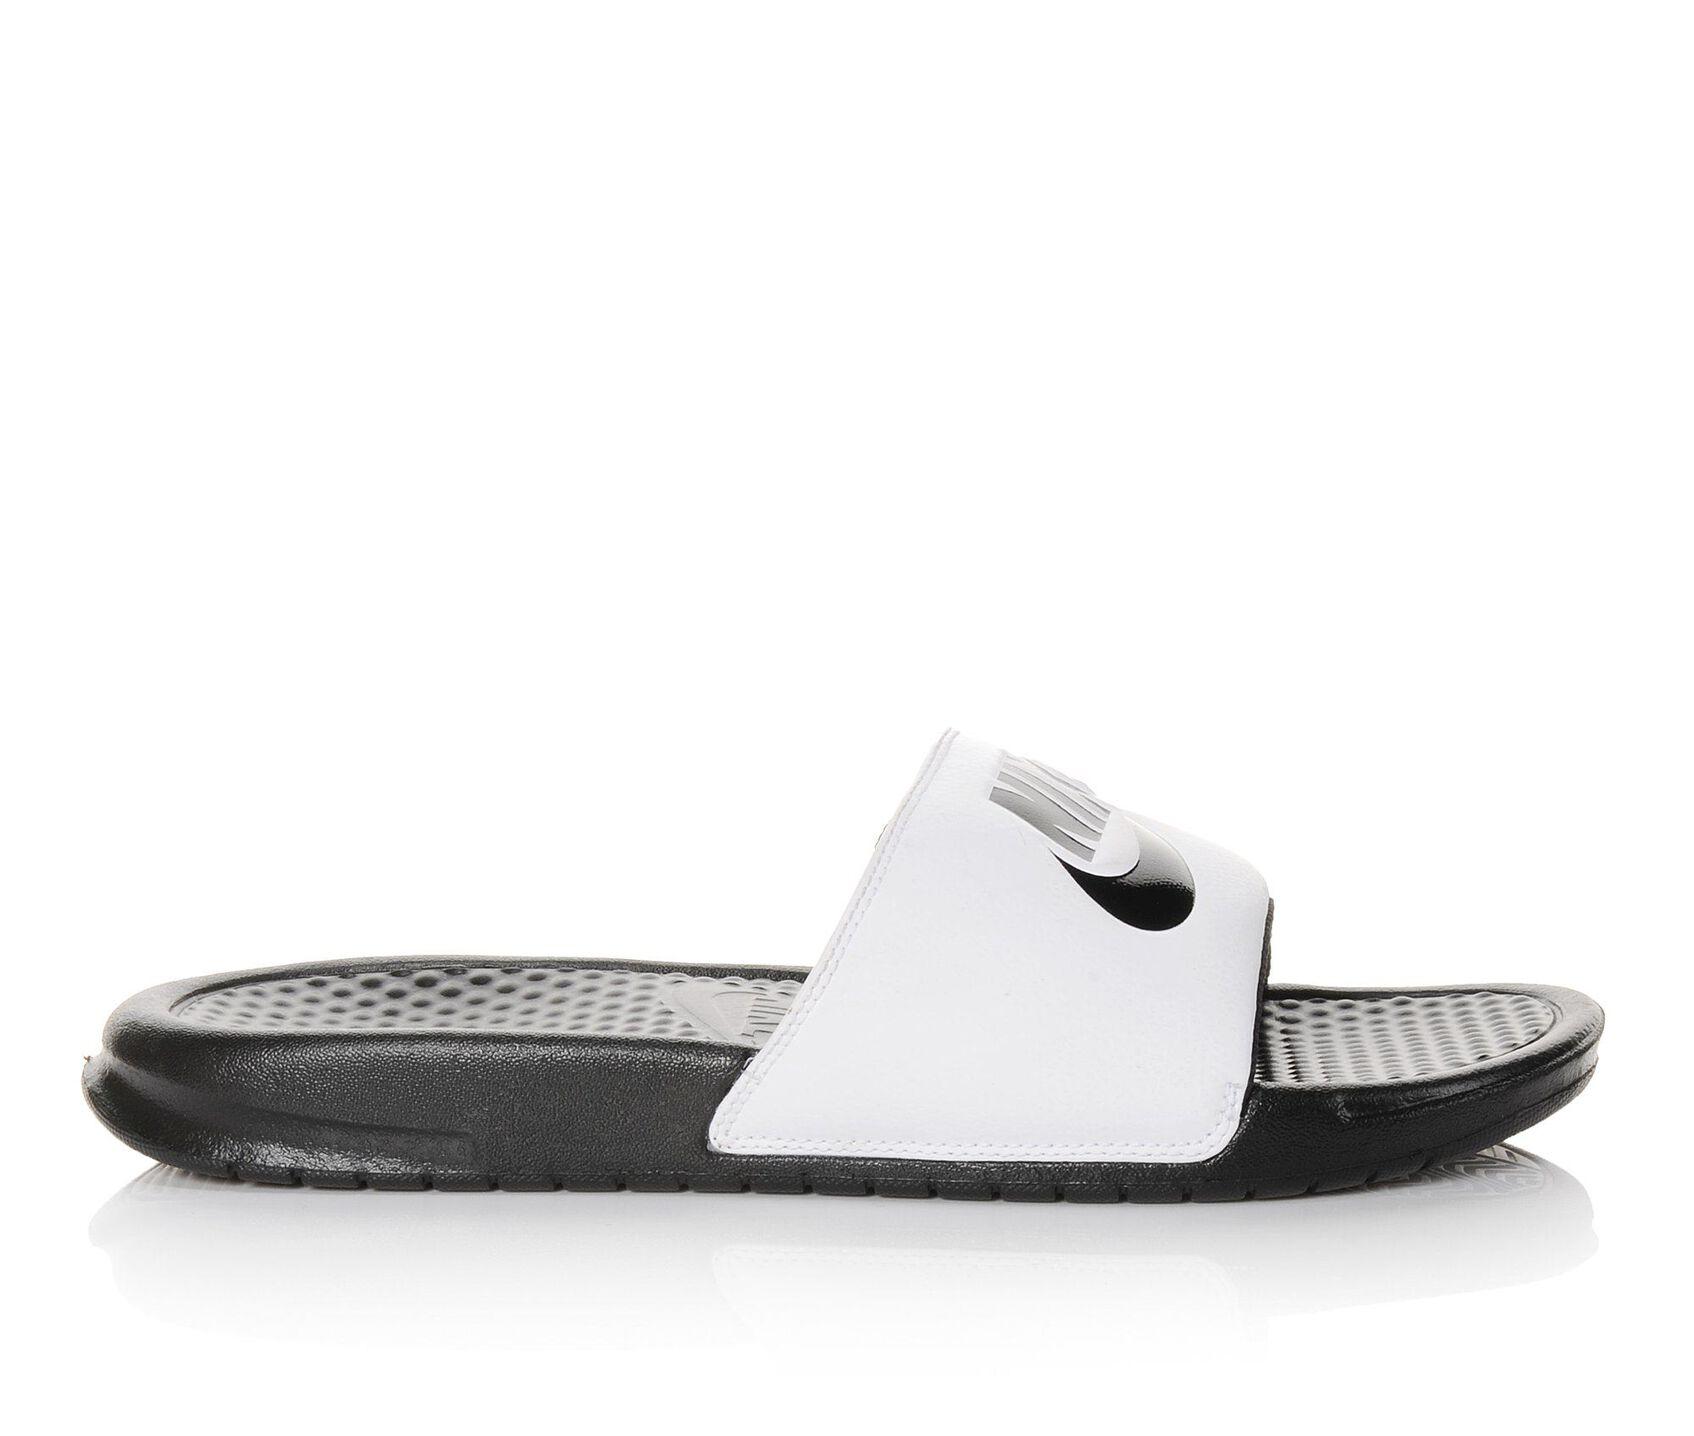 062362f0a59 Men s Nike Benassi JDI Sport Slides